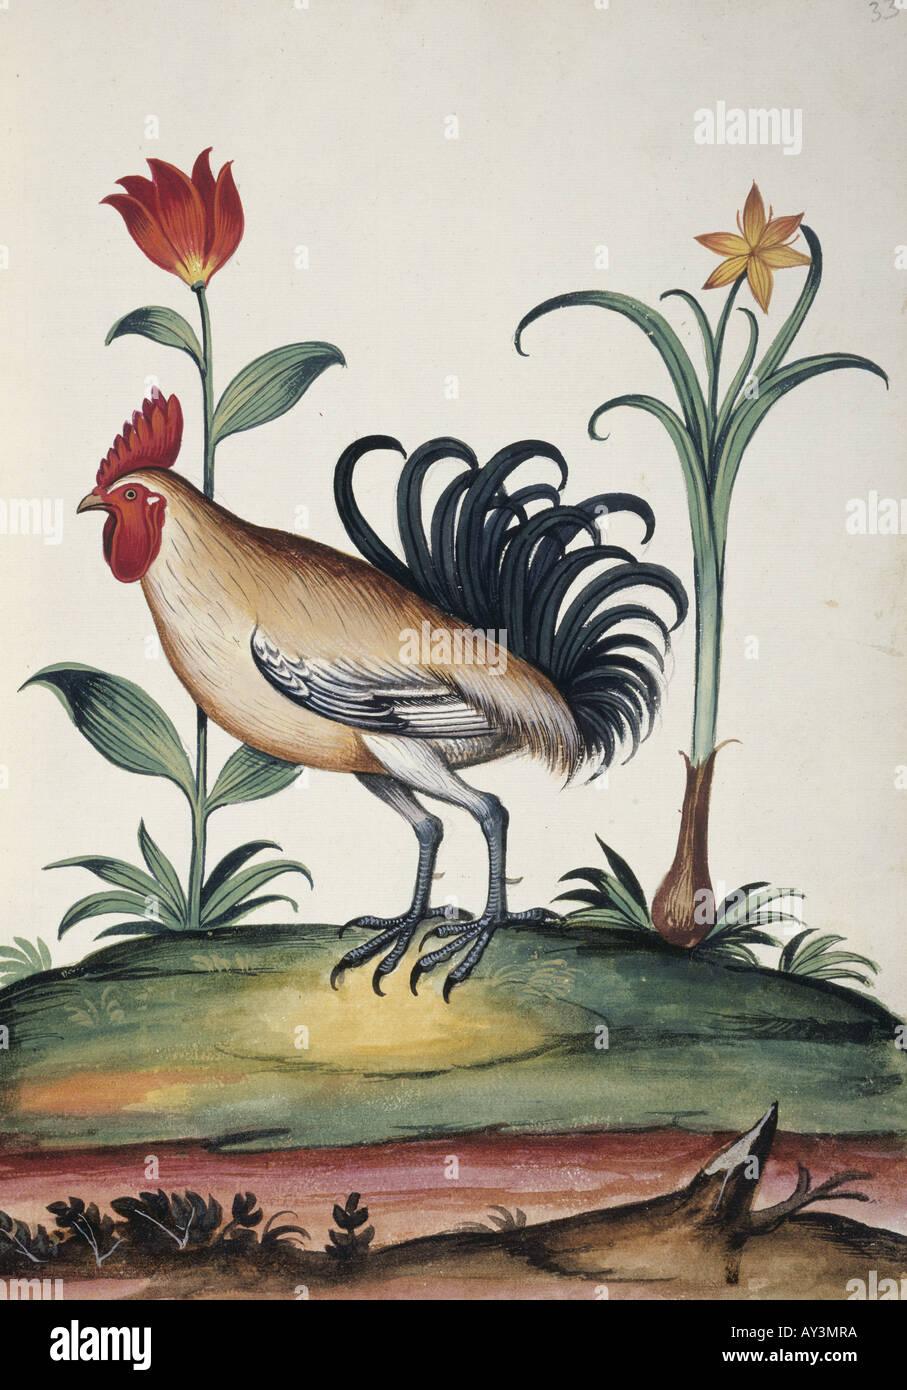 Unidentified junglefowl - Stock Image